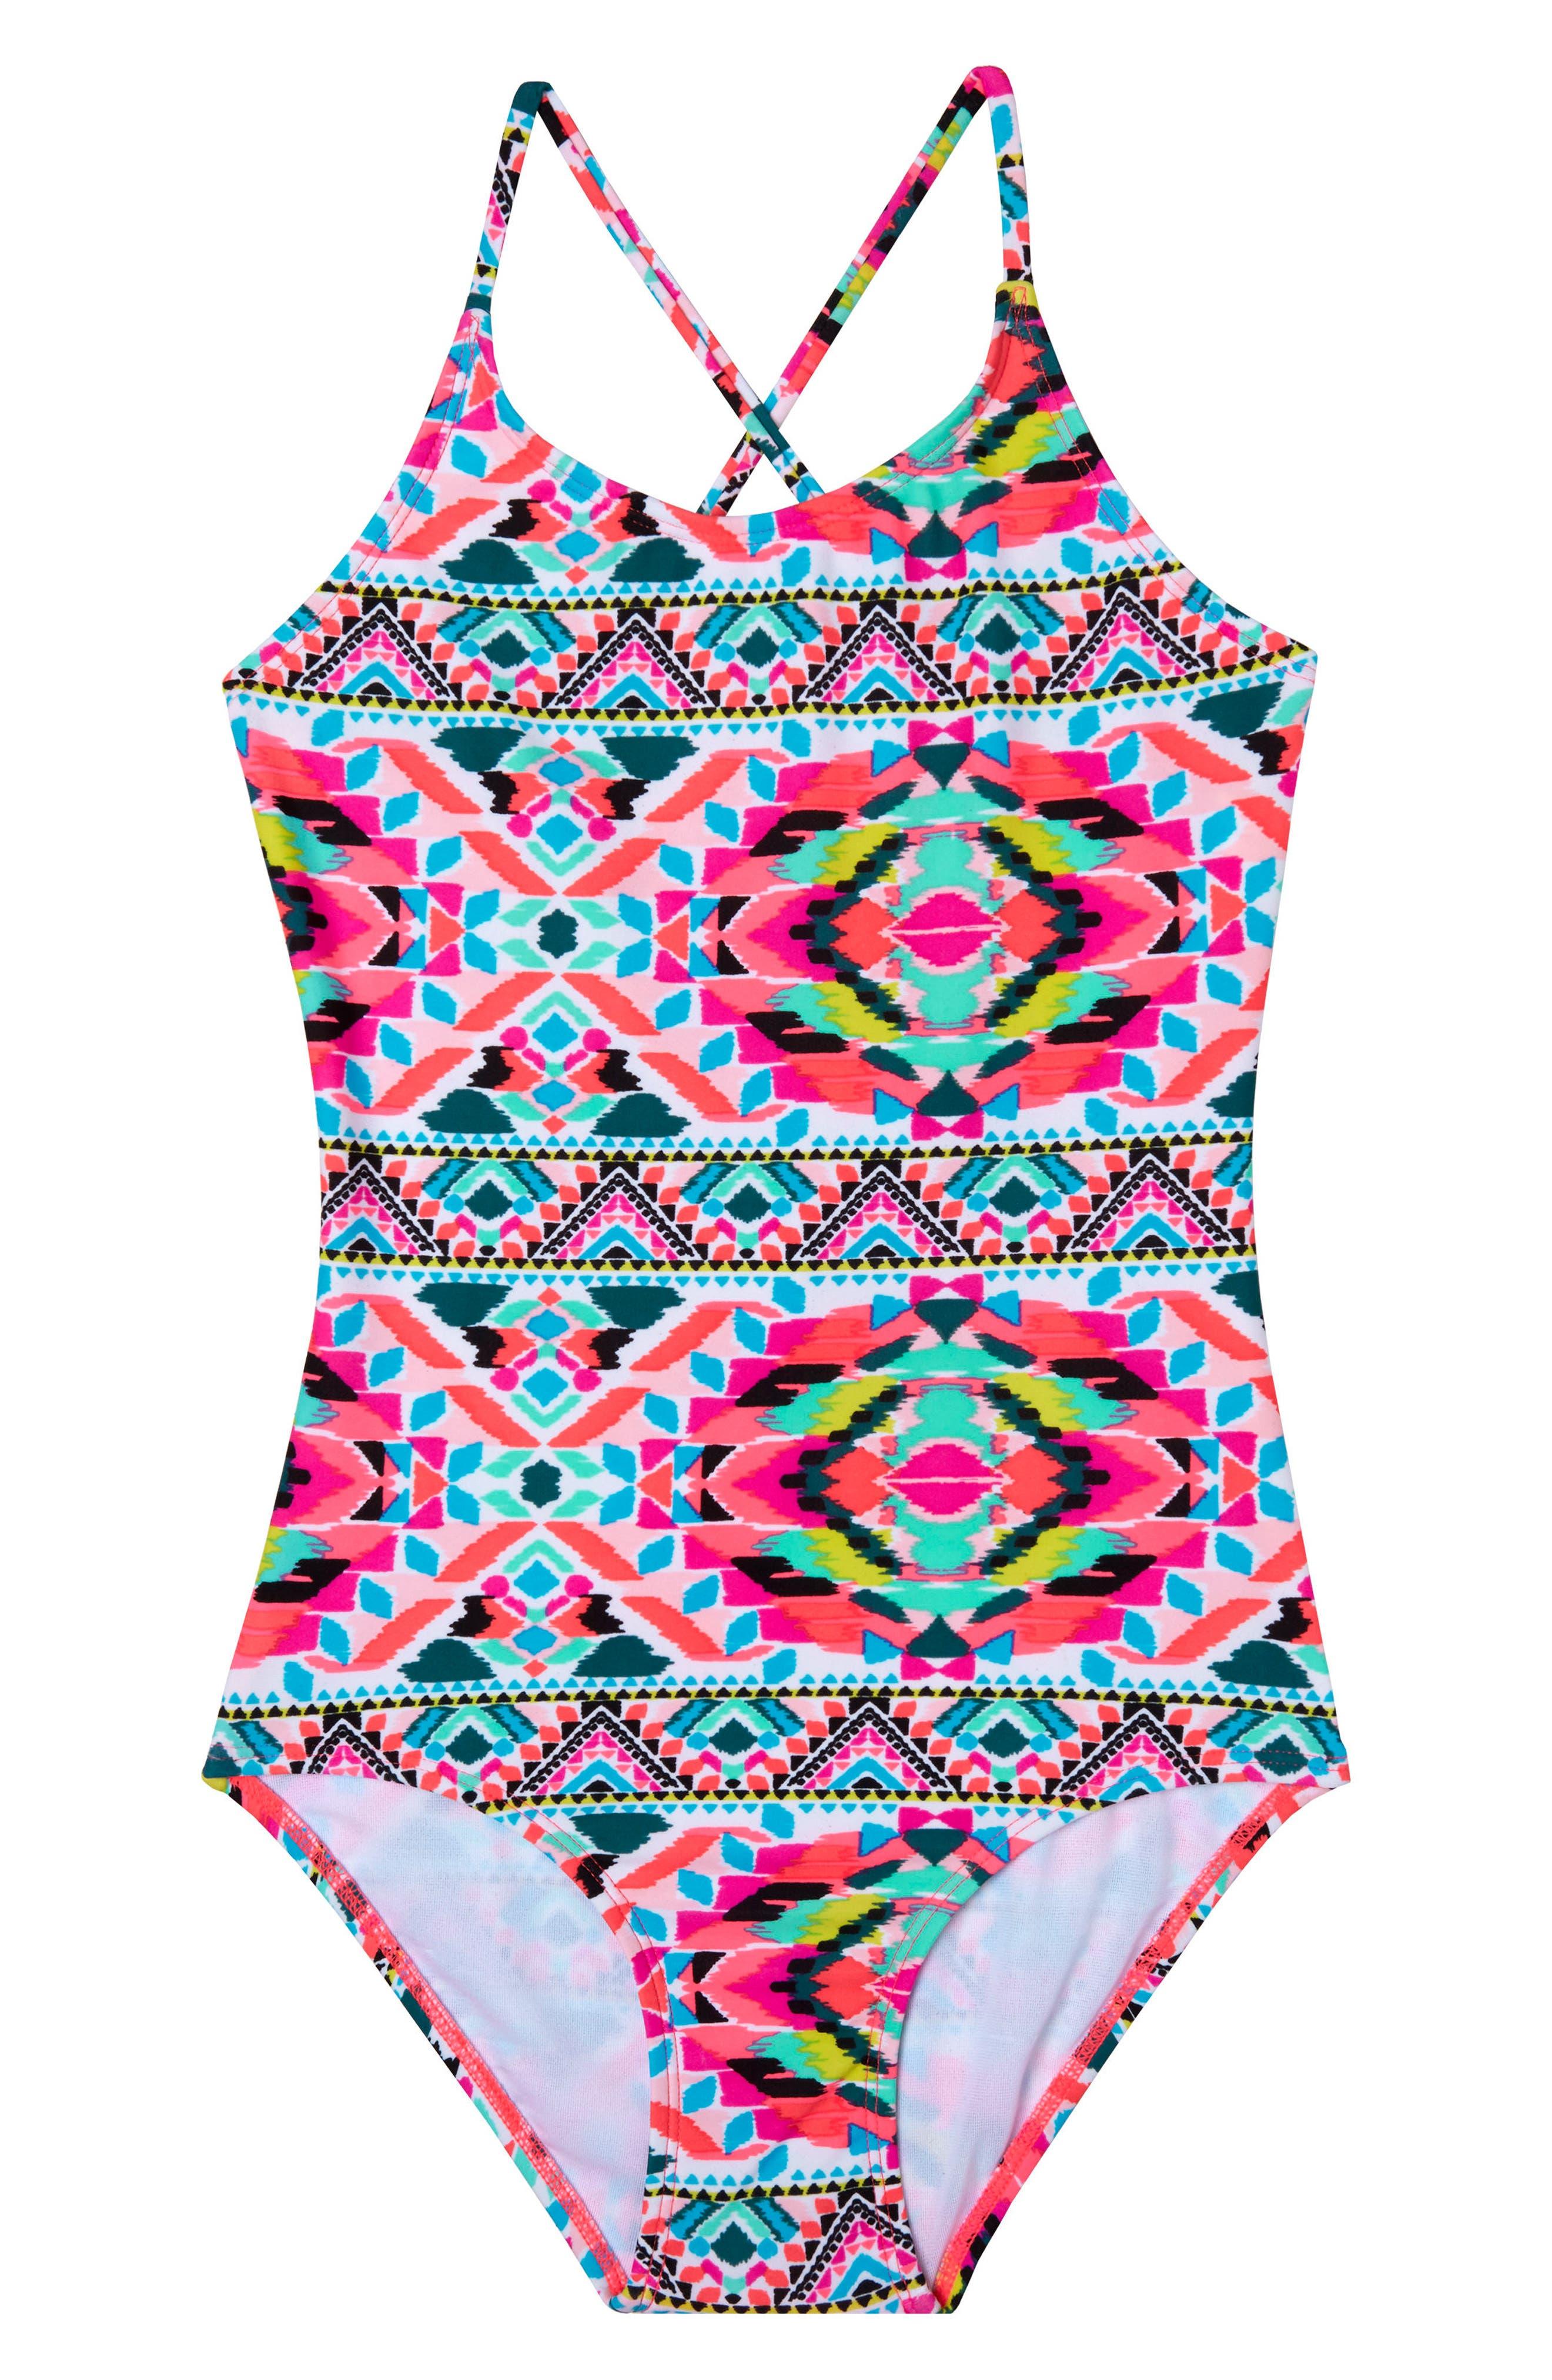 GOSSIP GIRL Surfside Solstice One-Piece Swimsuit, Main, color, 658